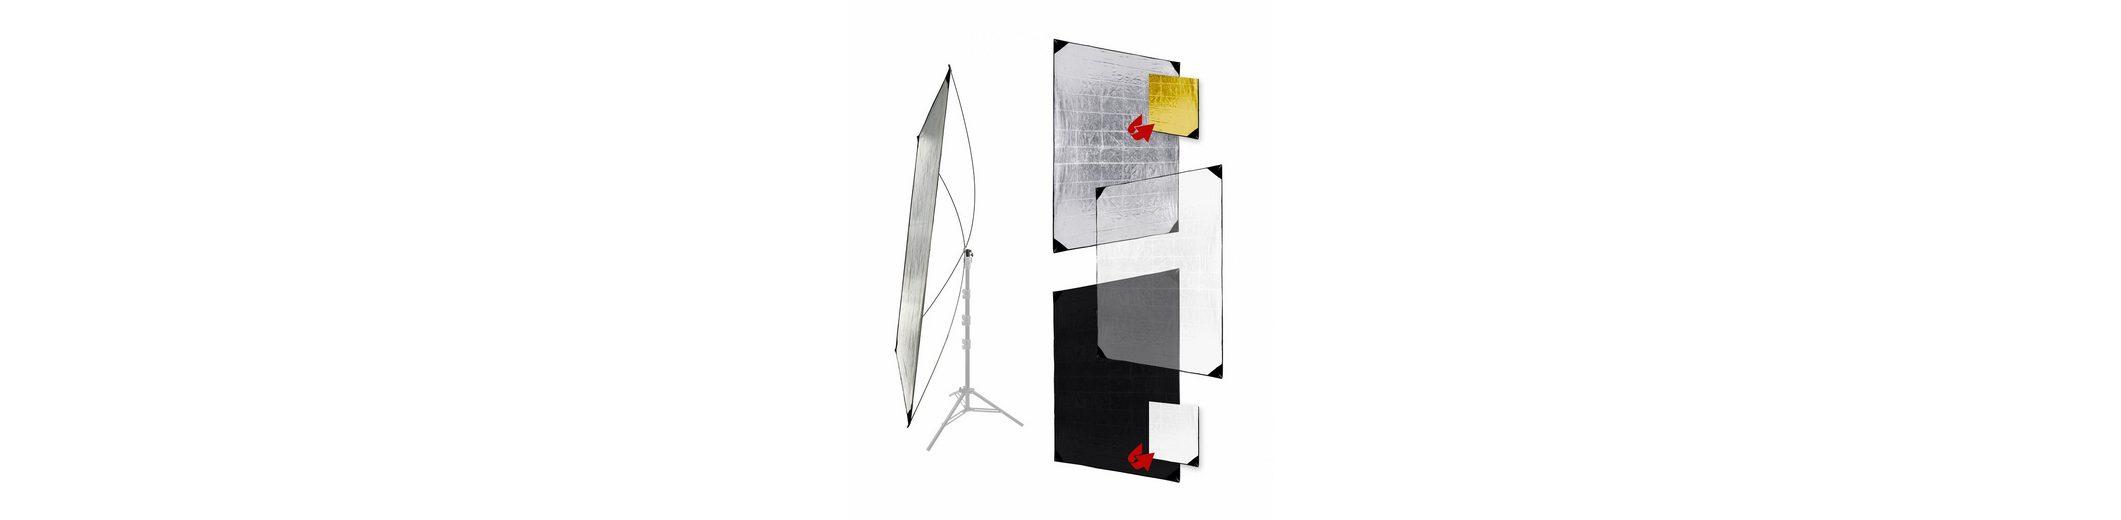 Bresser Fotostudio »BRESSER TR-11 5 in 1 Reflektorpanel 150x200cm«